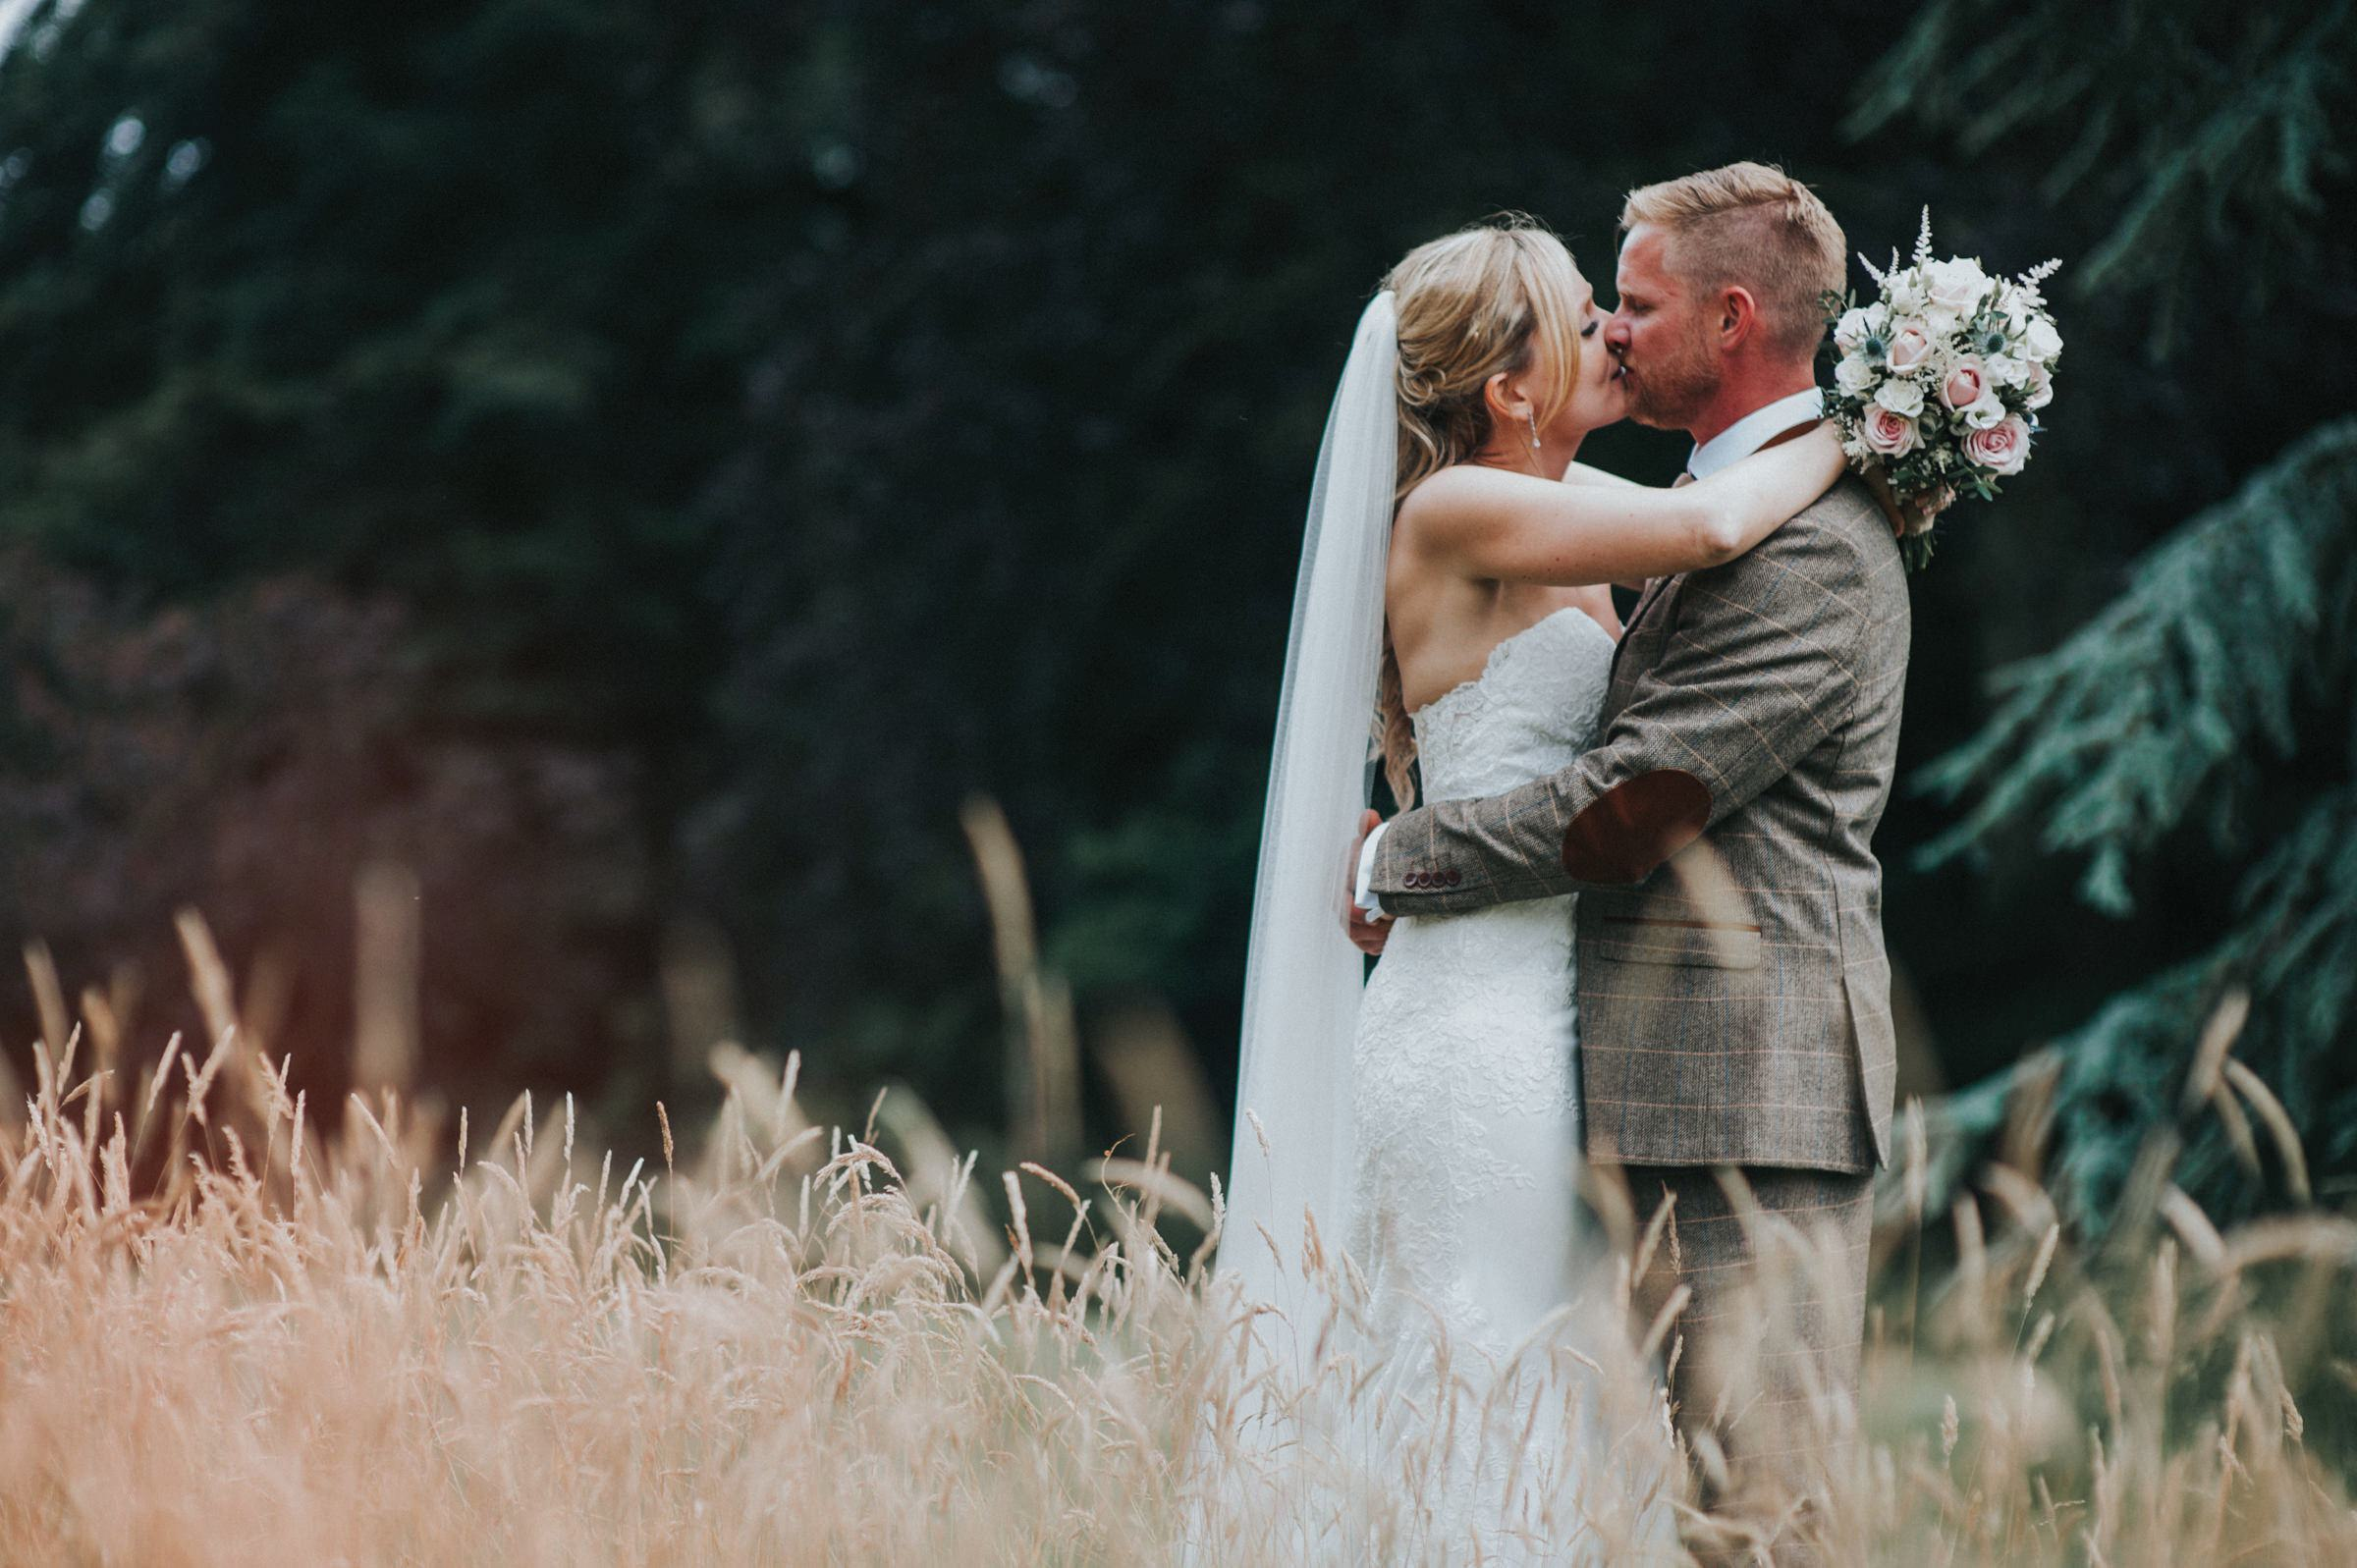 Falconhurst Kent Wedding Venue Sussex Weddings-6699.JPG